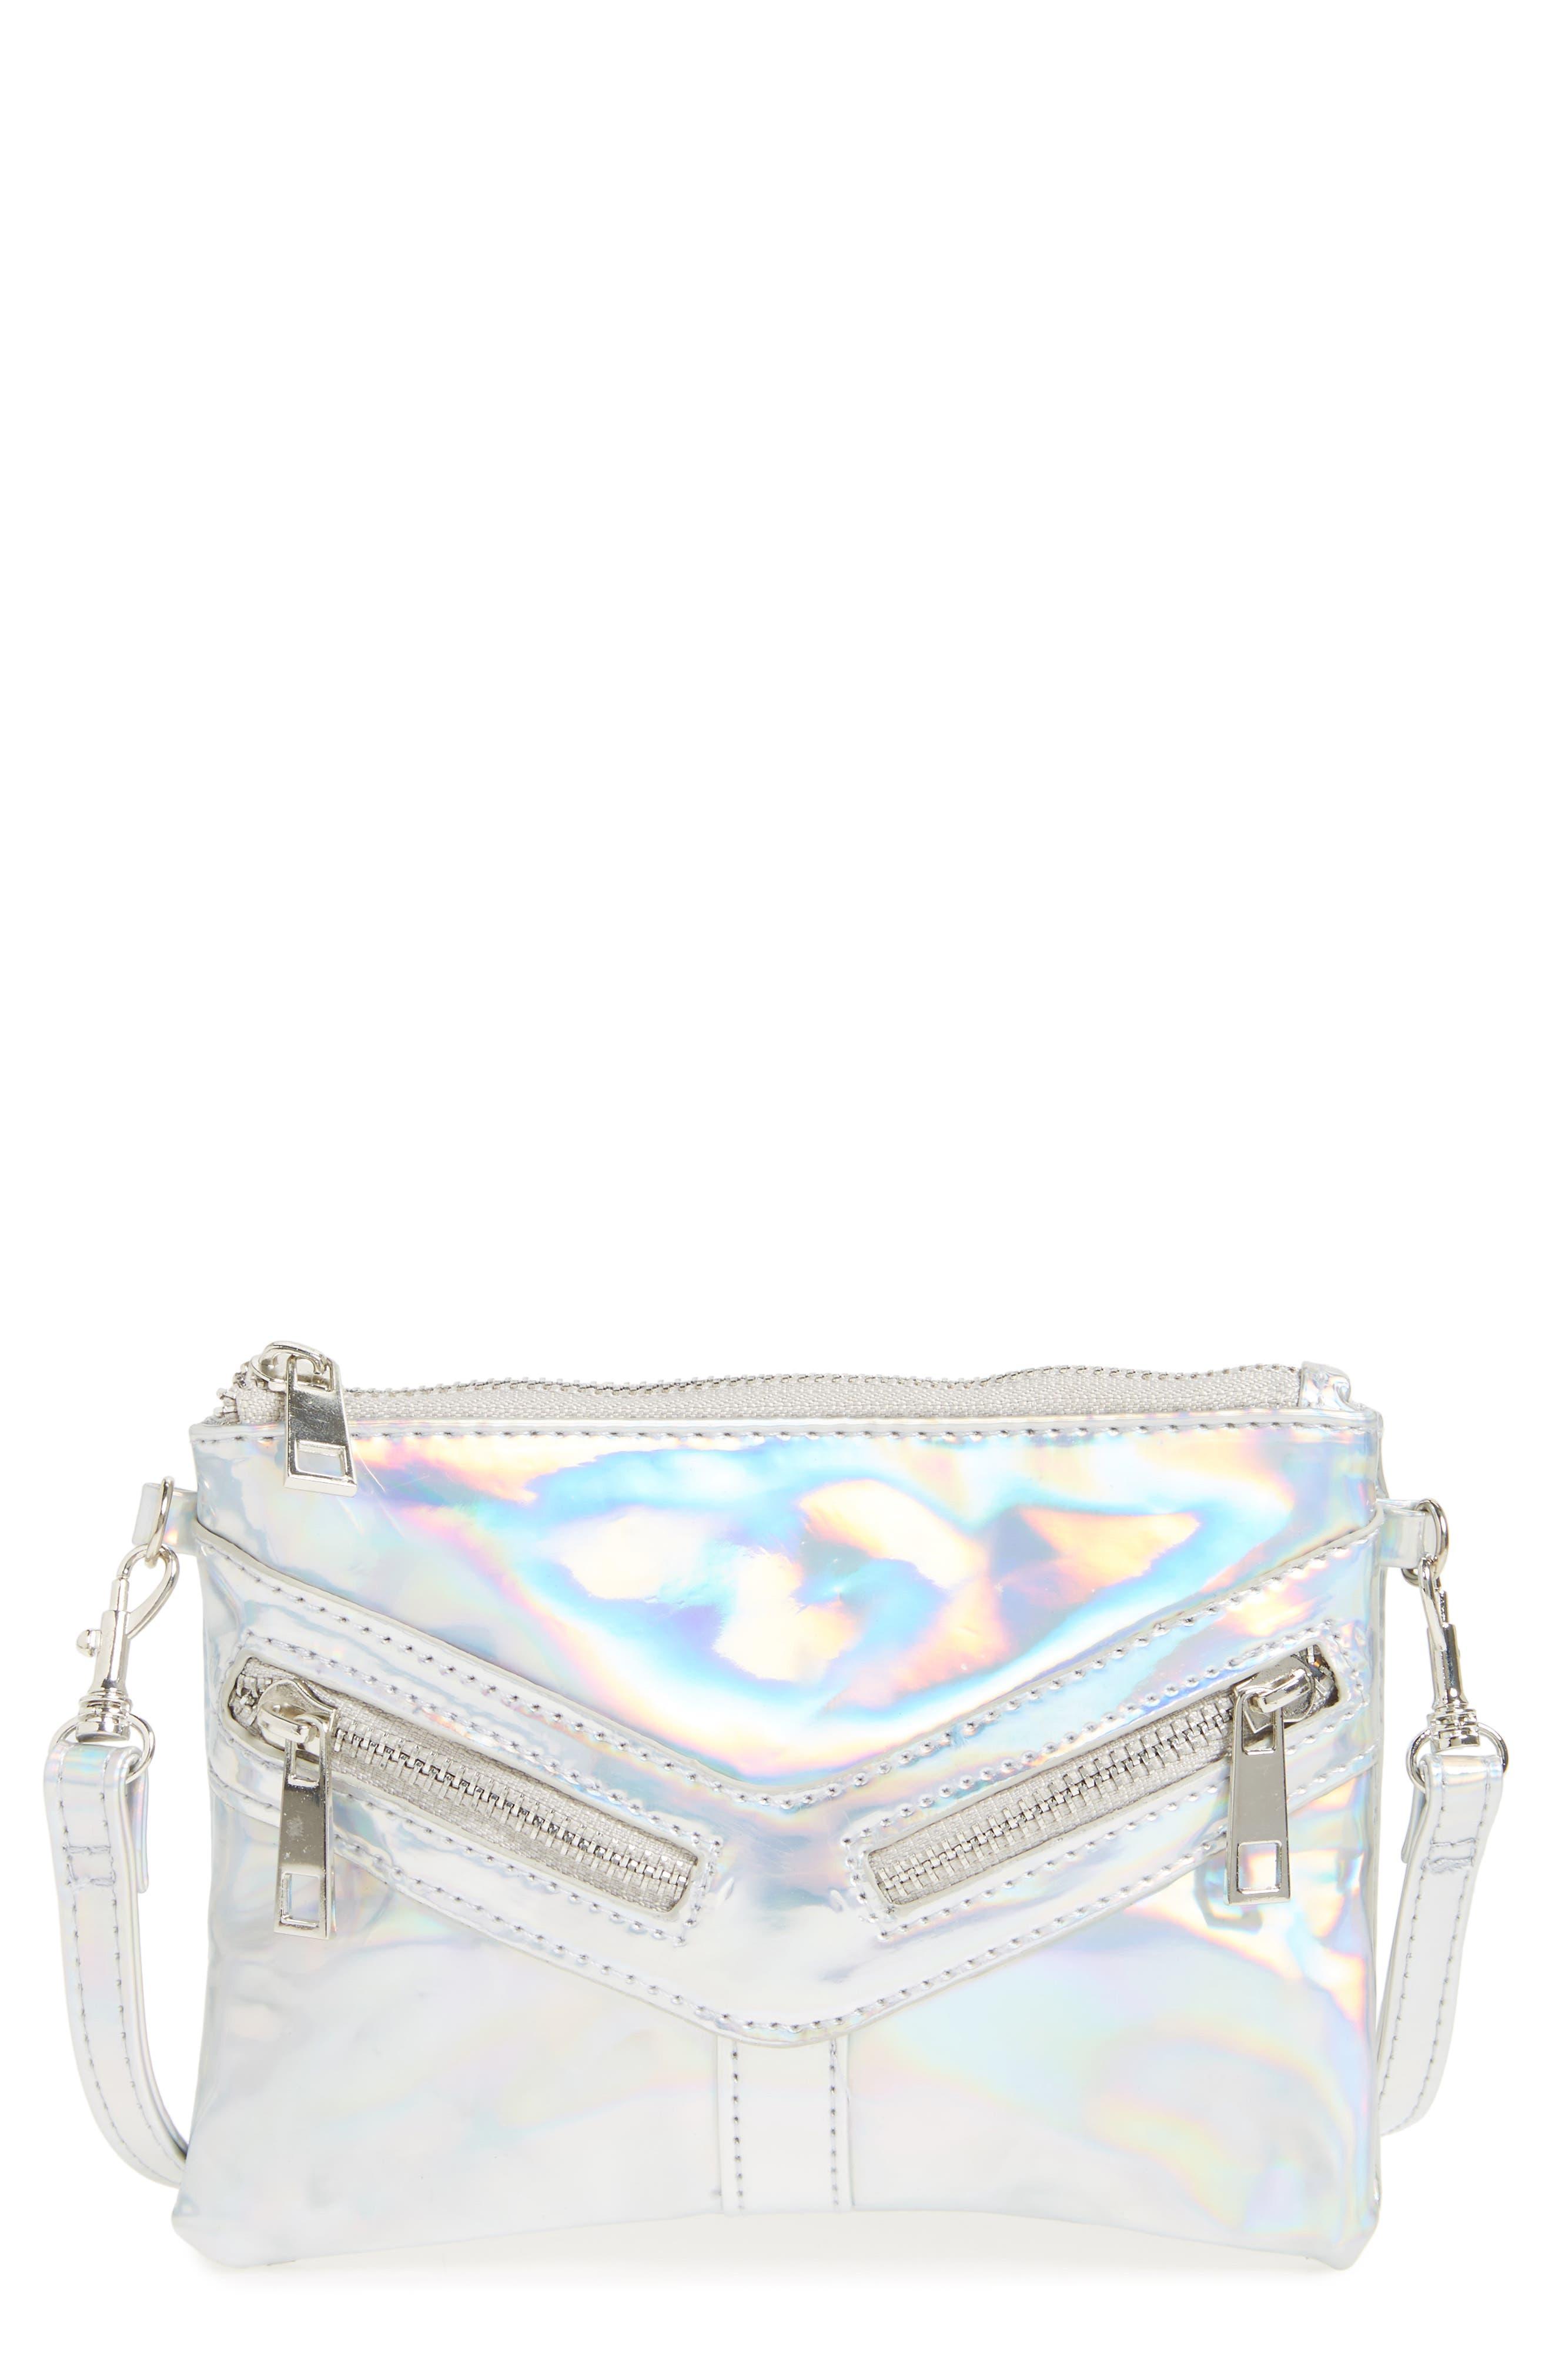 CAPELLI OF NEW YORK Hologram Crossbody Bag